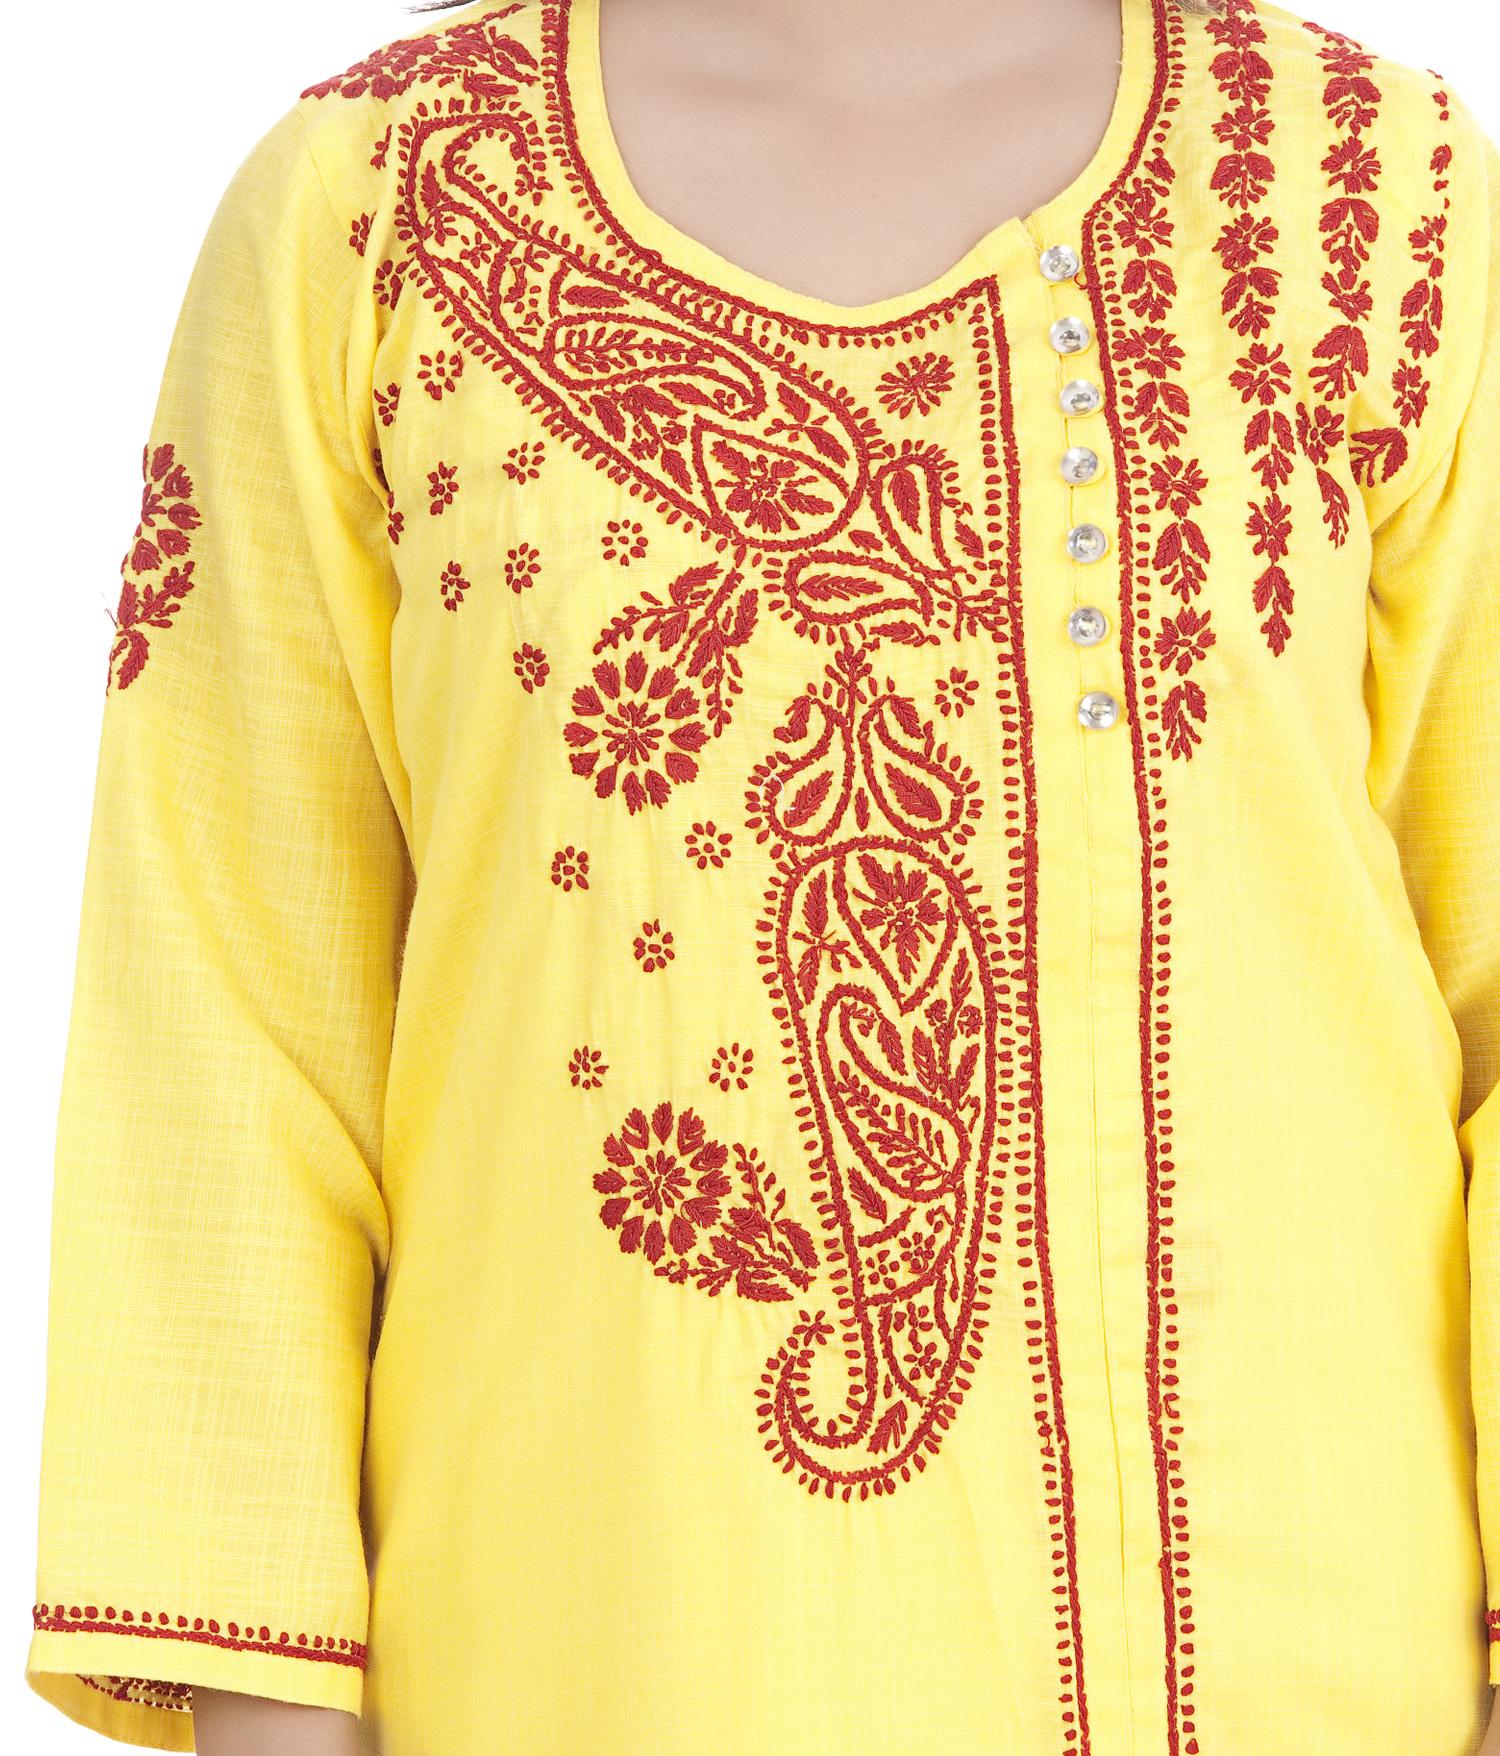 Ethnava Hand Embroidered Rayon Slub Lucknowi Chikan Kurti